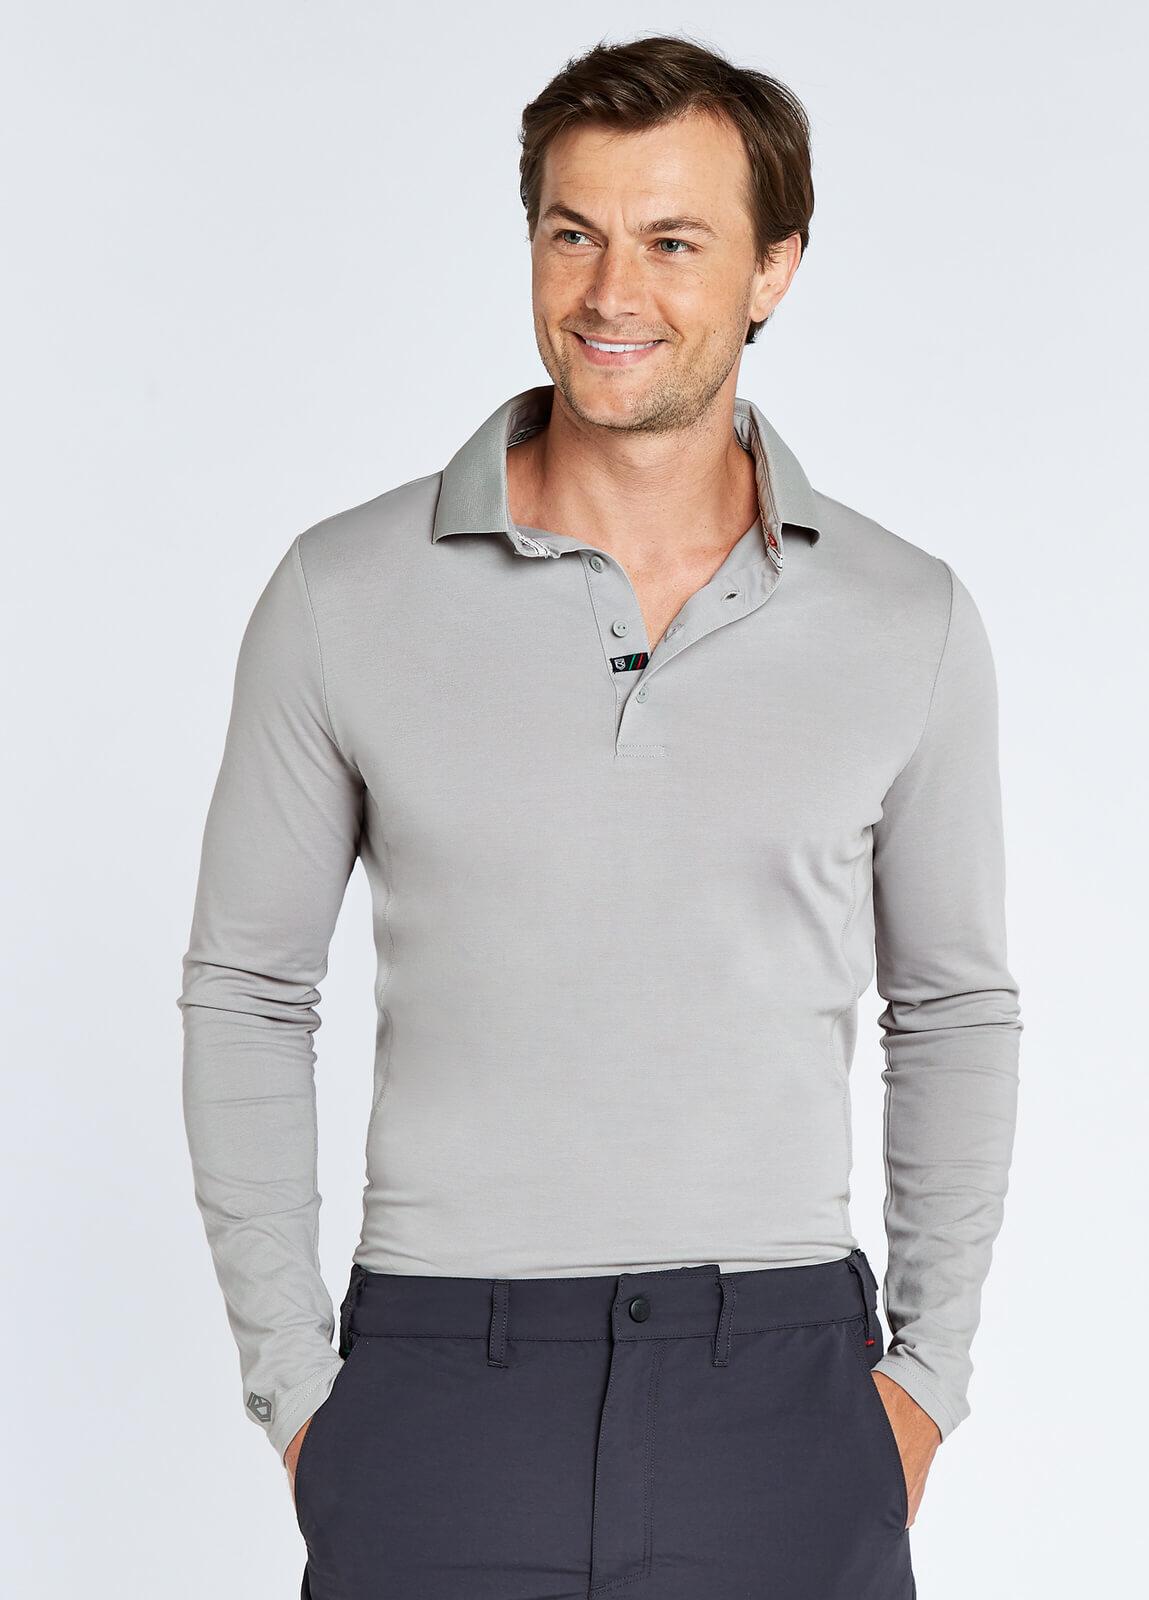 Freshford Unisex Long-sleeved Polo - Platinum